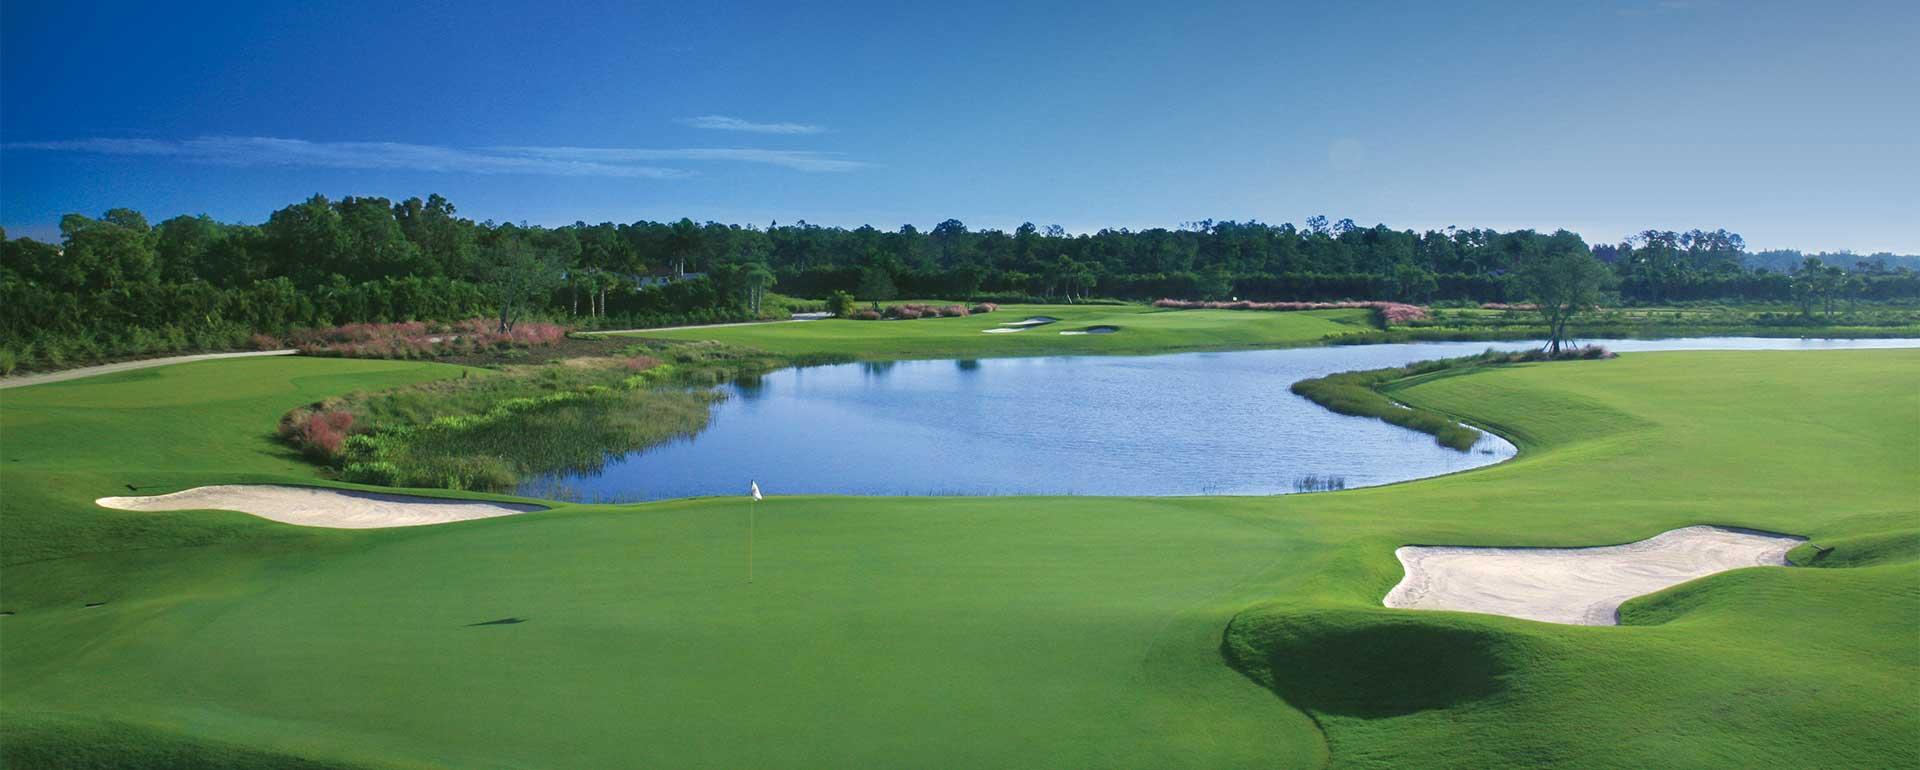 Golf Course, Treviso Bay, Peninsula, TPC Golf, Naples, Florida, Paradise Coast, Peninsula Treviso Bay